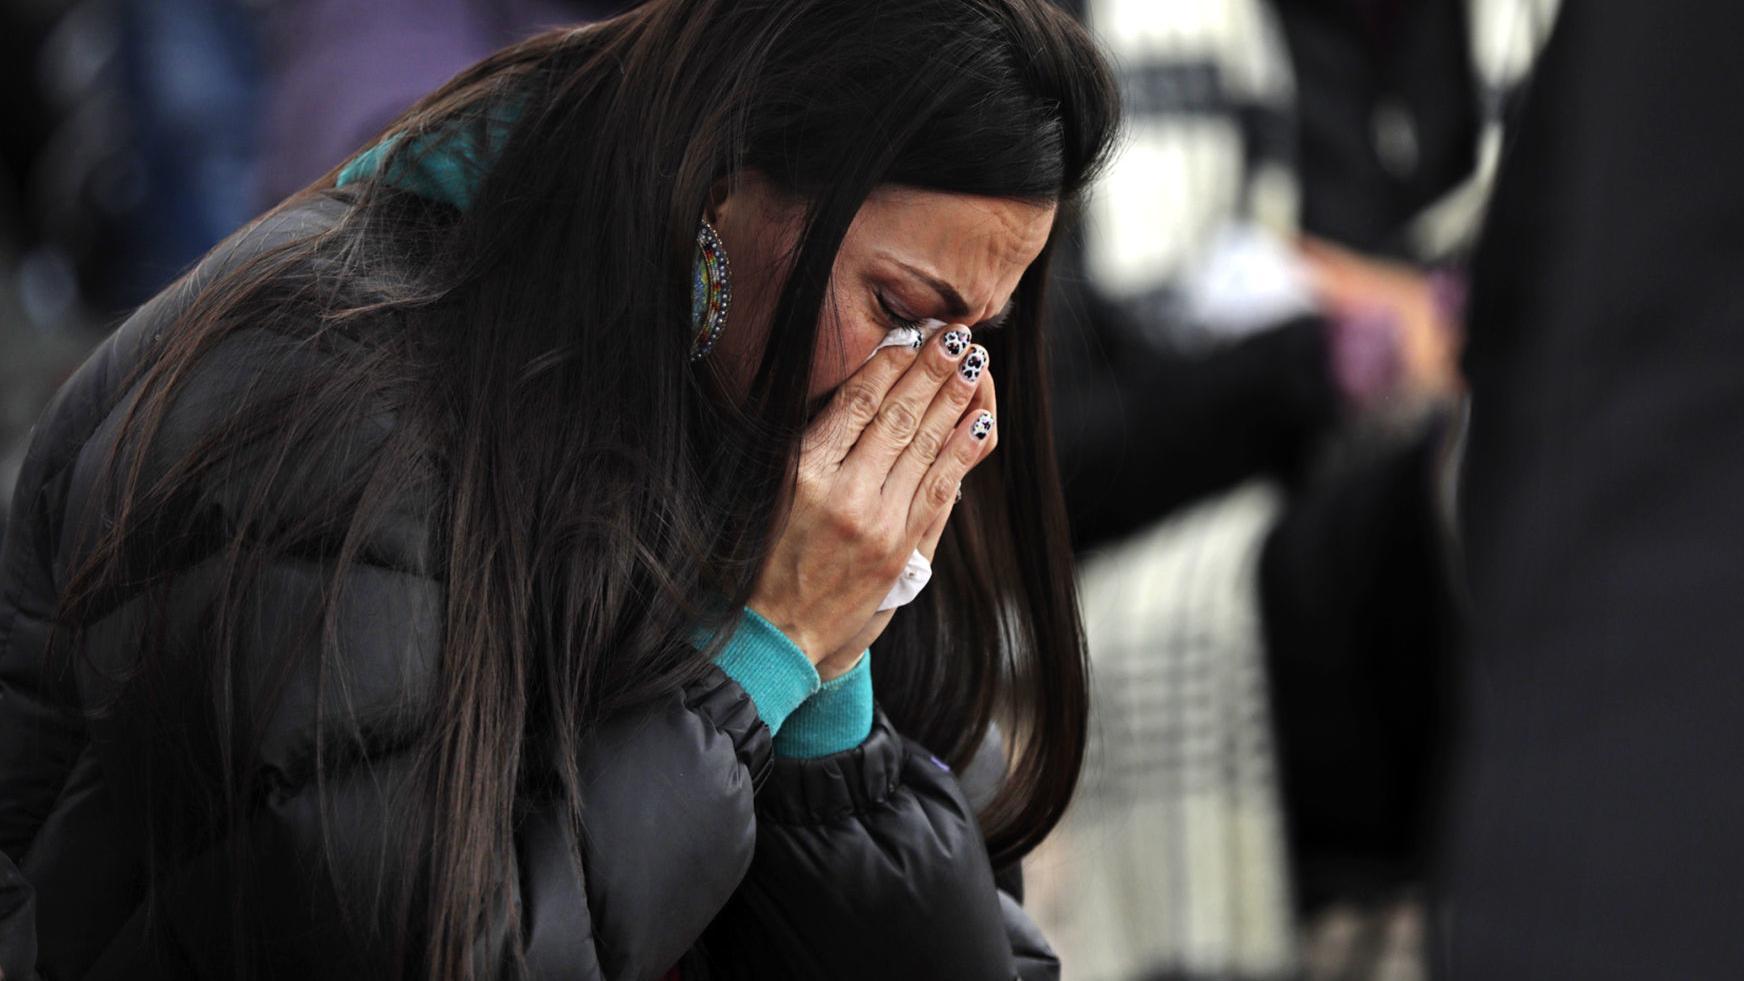 Missoula vigil keeps focus on missing and murdered indigenous women